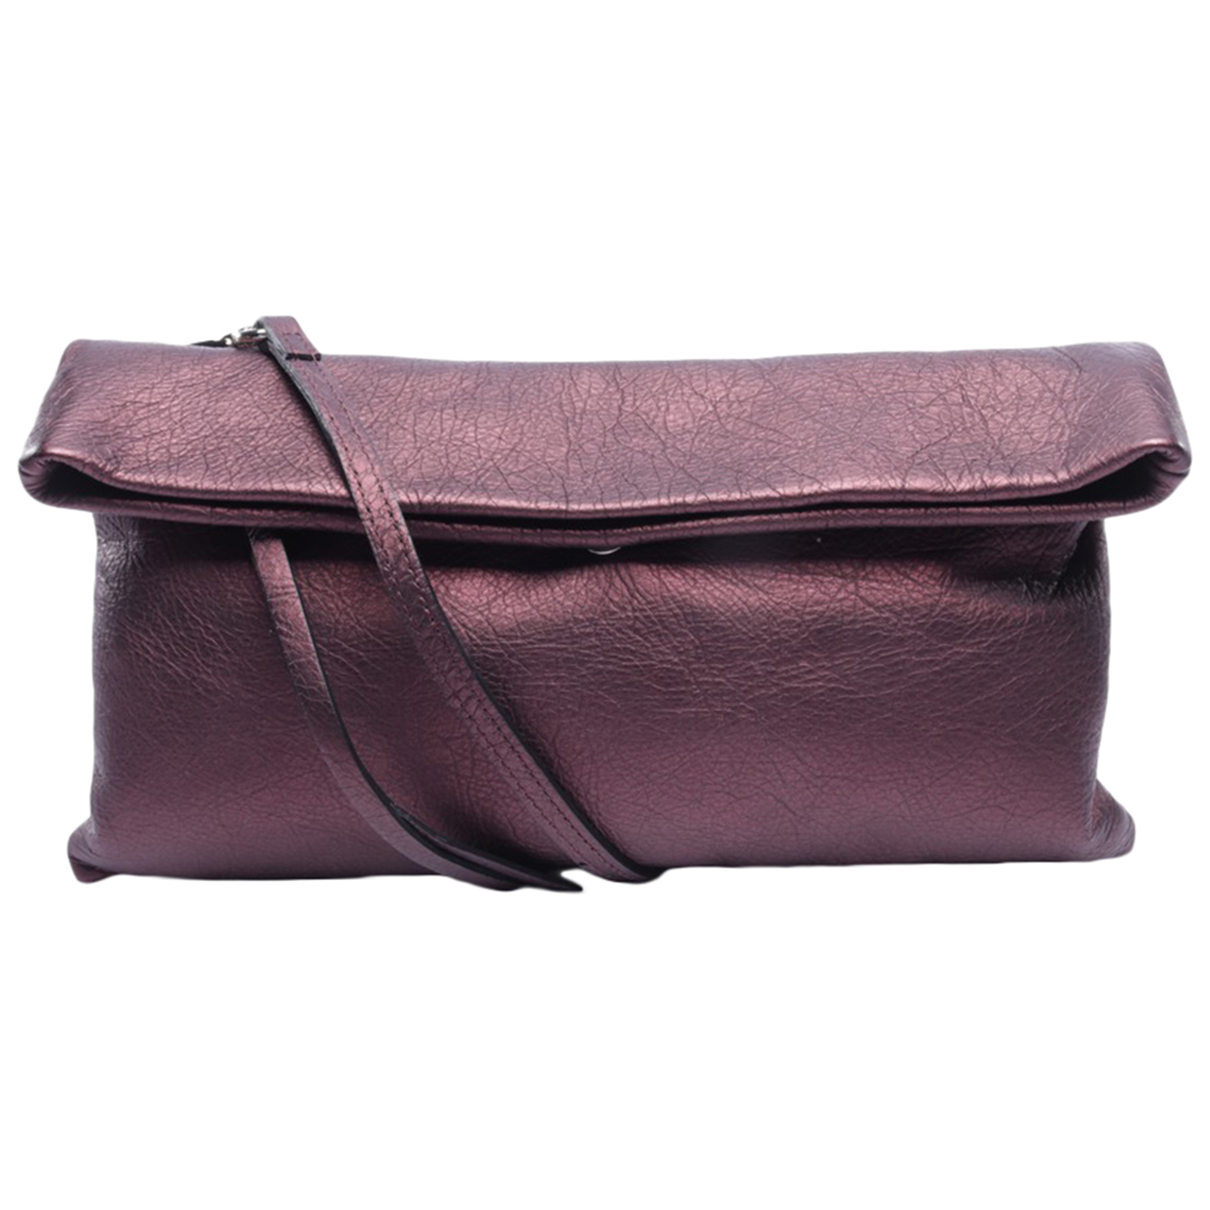 Gianni Chiarini \N Handtasche in  Lila Leder